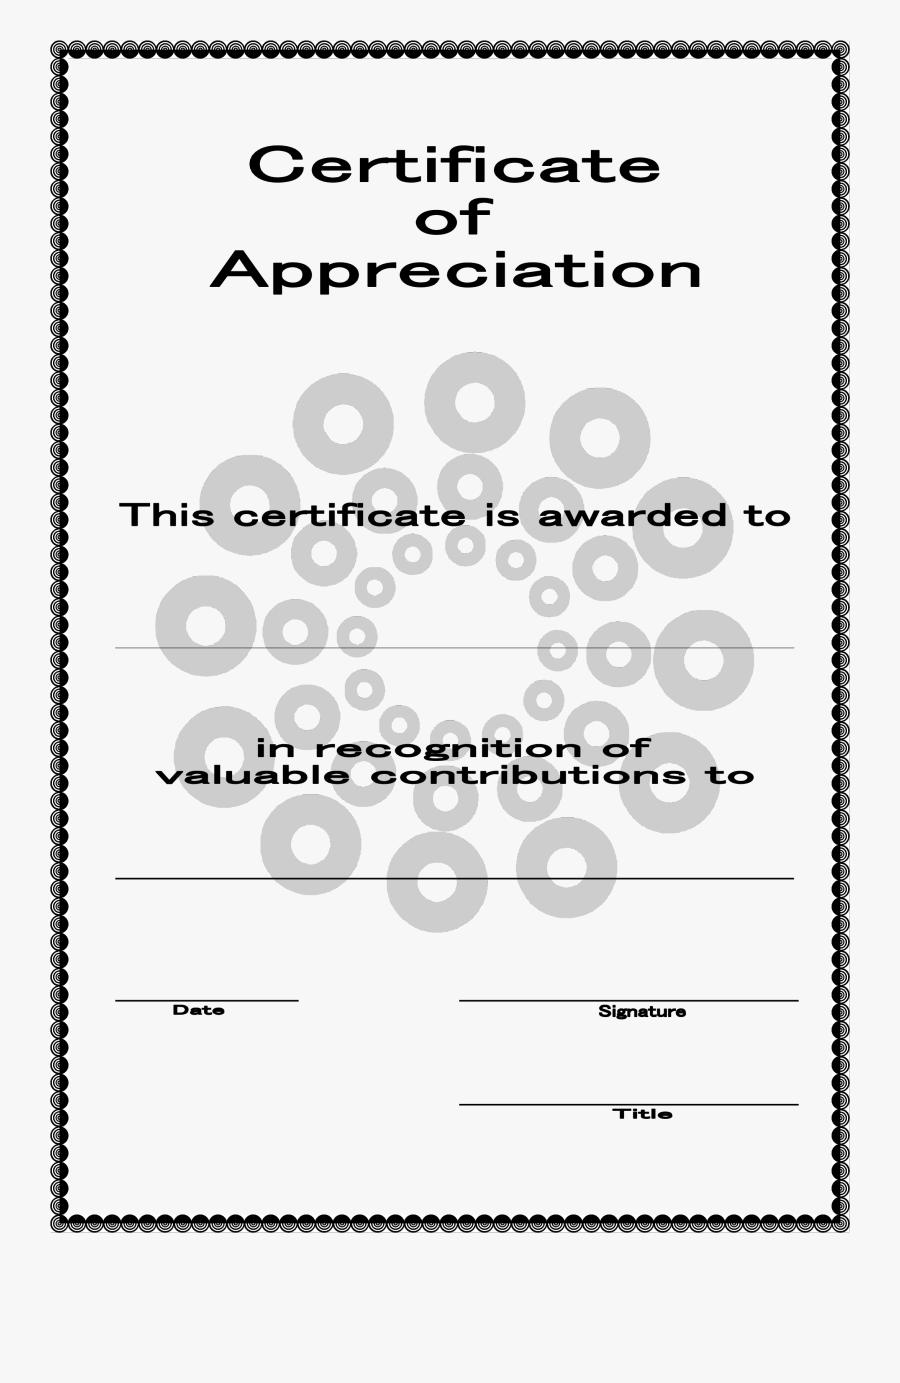 Certificate Of Appreciation Template Certificate Of - Appreciation Certificate Templates, Transparent Clipart